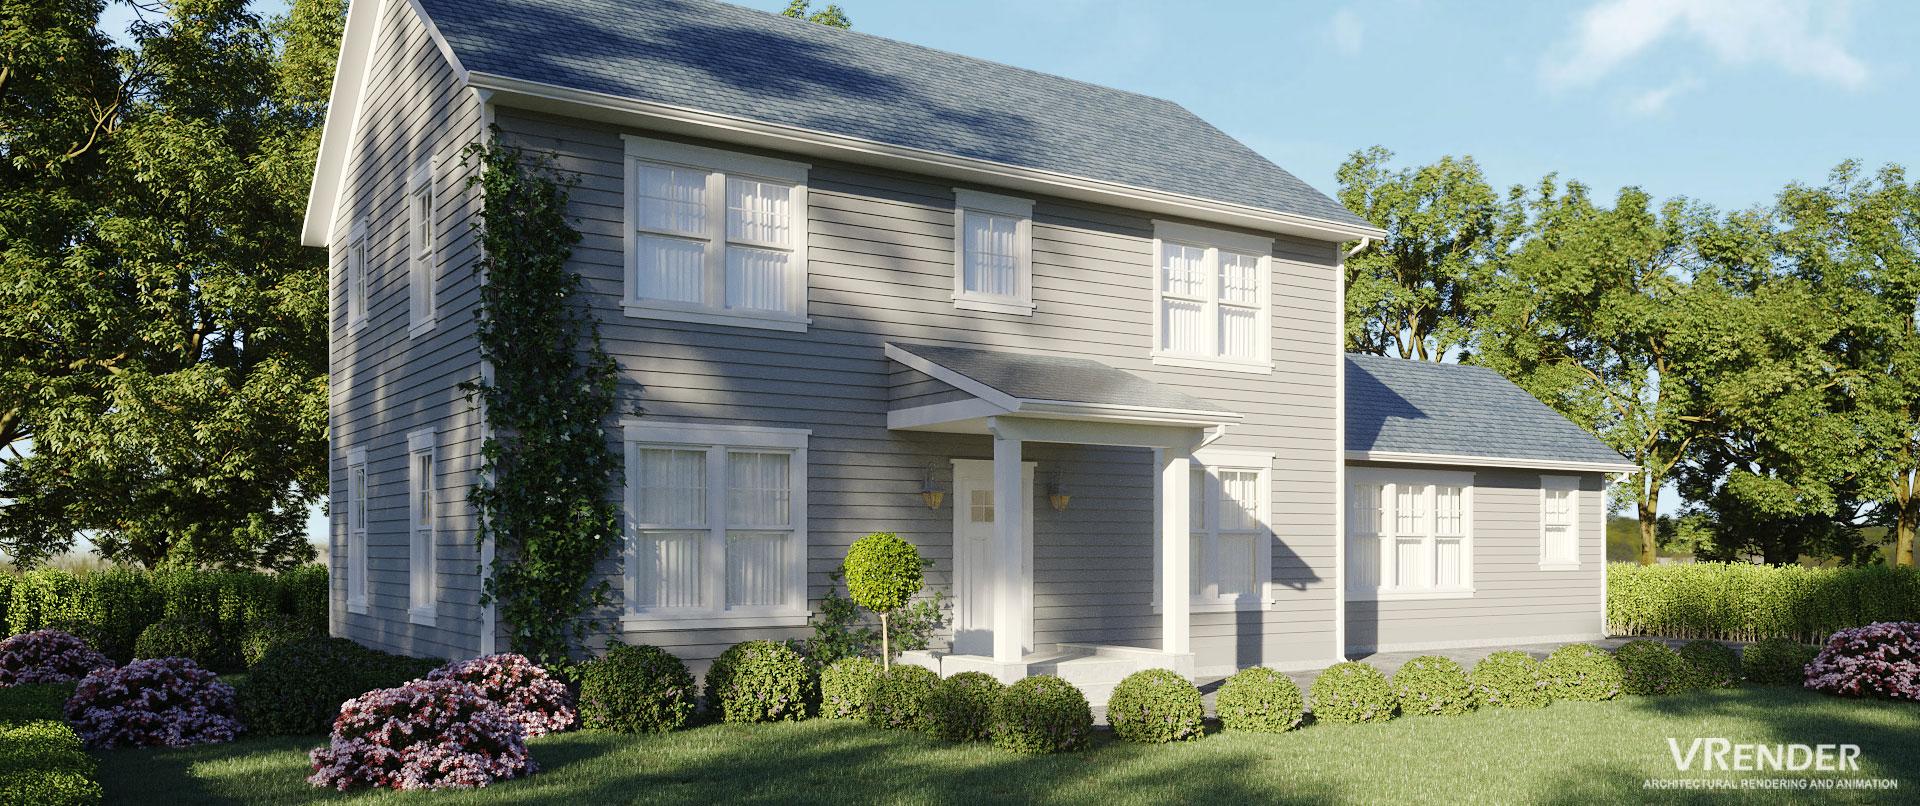 Vrender Architectural 3D rendering Services